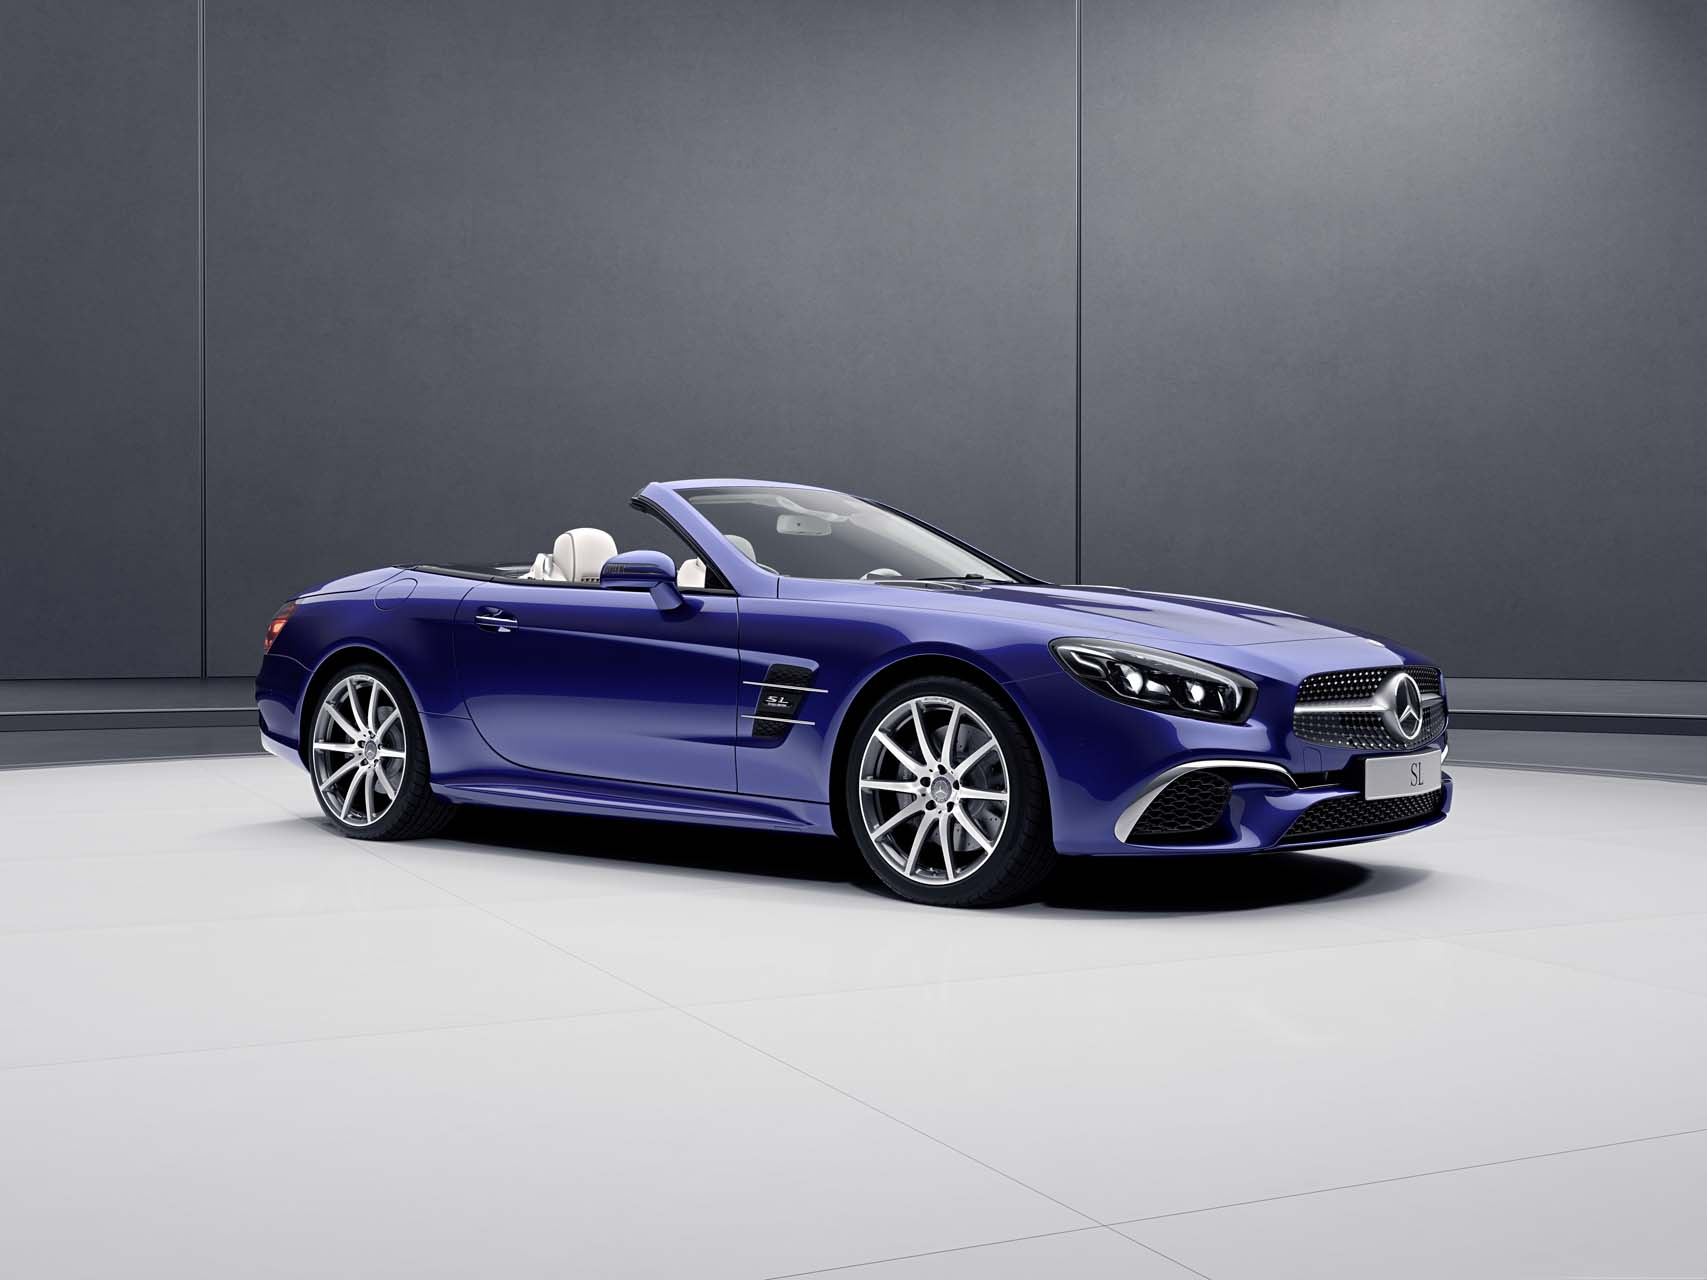 2018 mercedes benz sl class review ratings specs prices for Mercedes benz sl class price